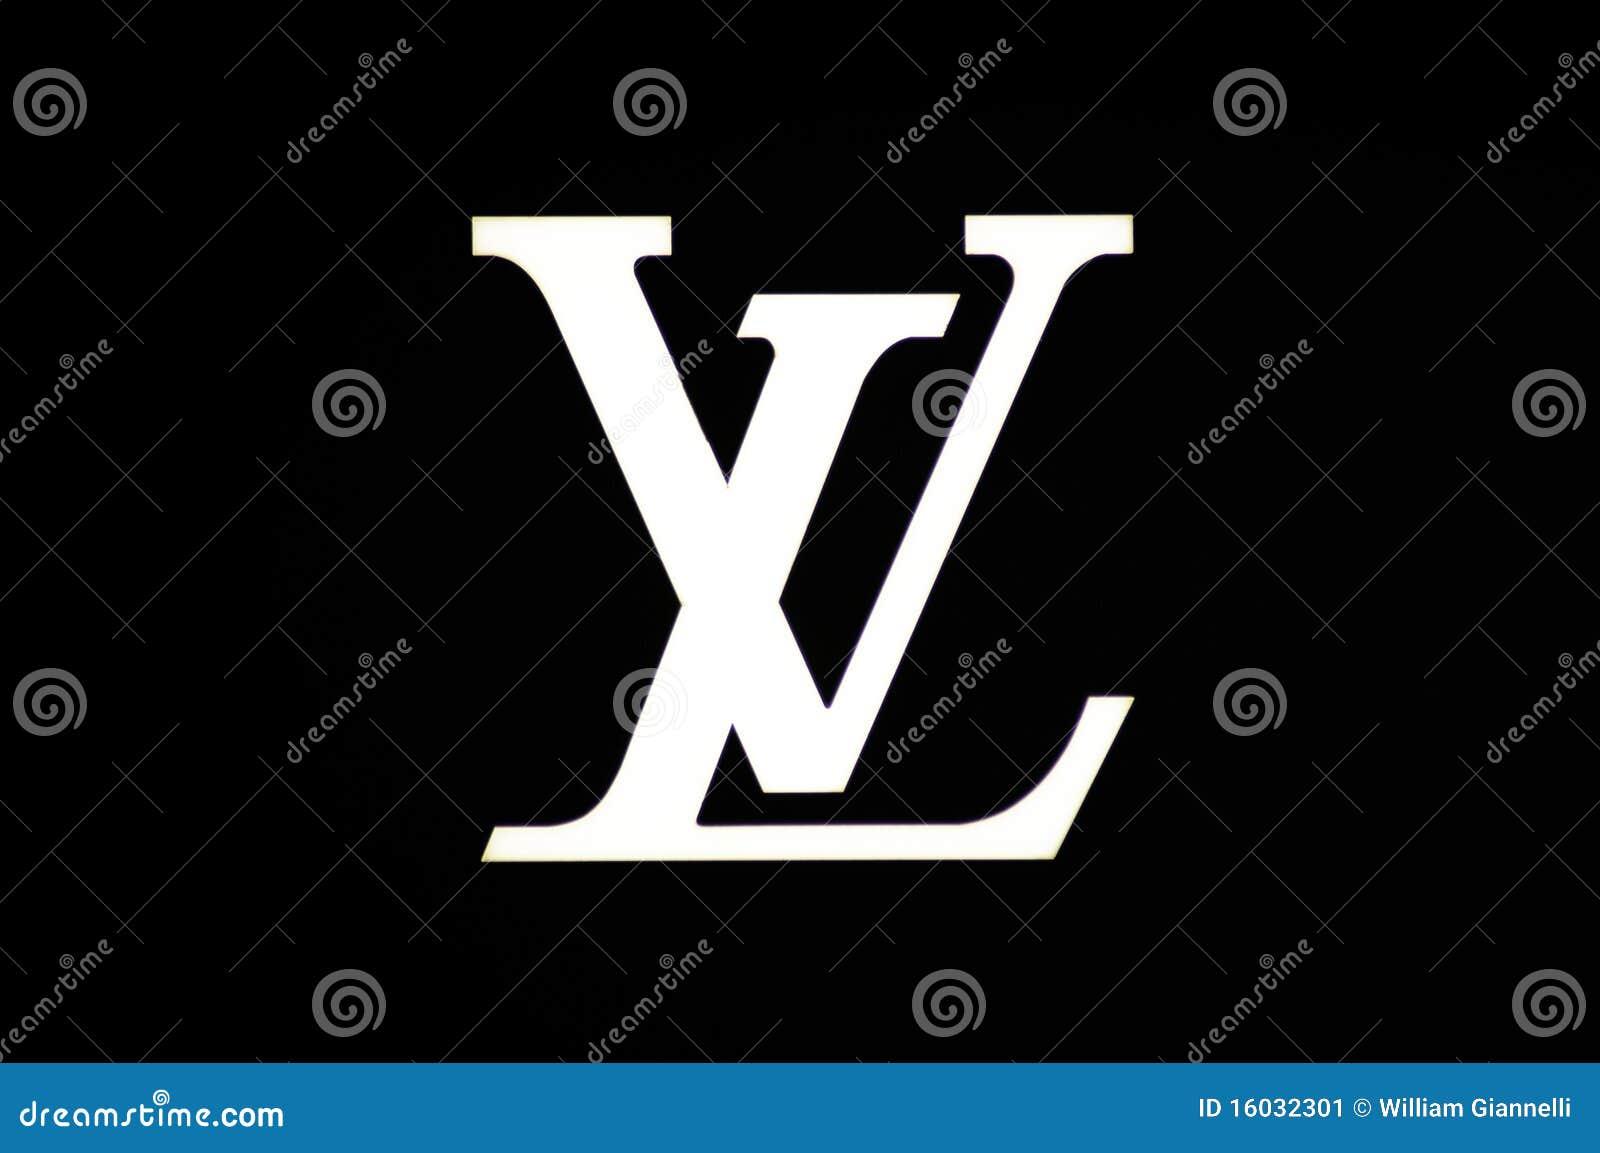 79dc7cbeebe00 Louis Vuitton logo editorial photo. Image of luxury